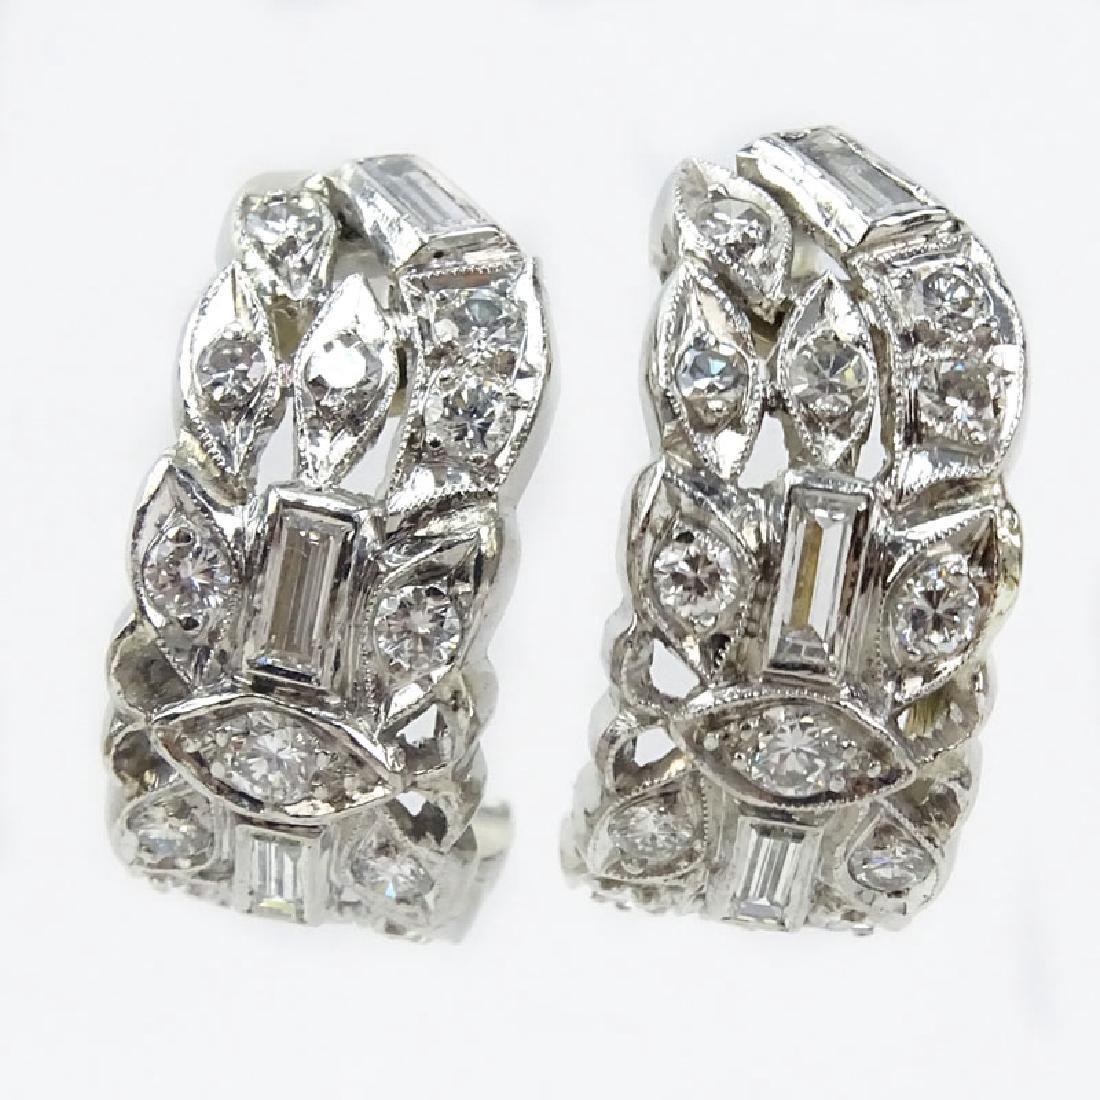 Vintage Approx. 2.25 Carat TW Diamond and Platinum